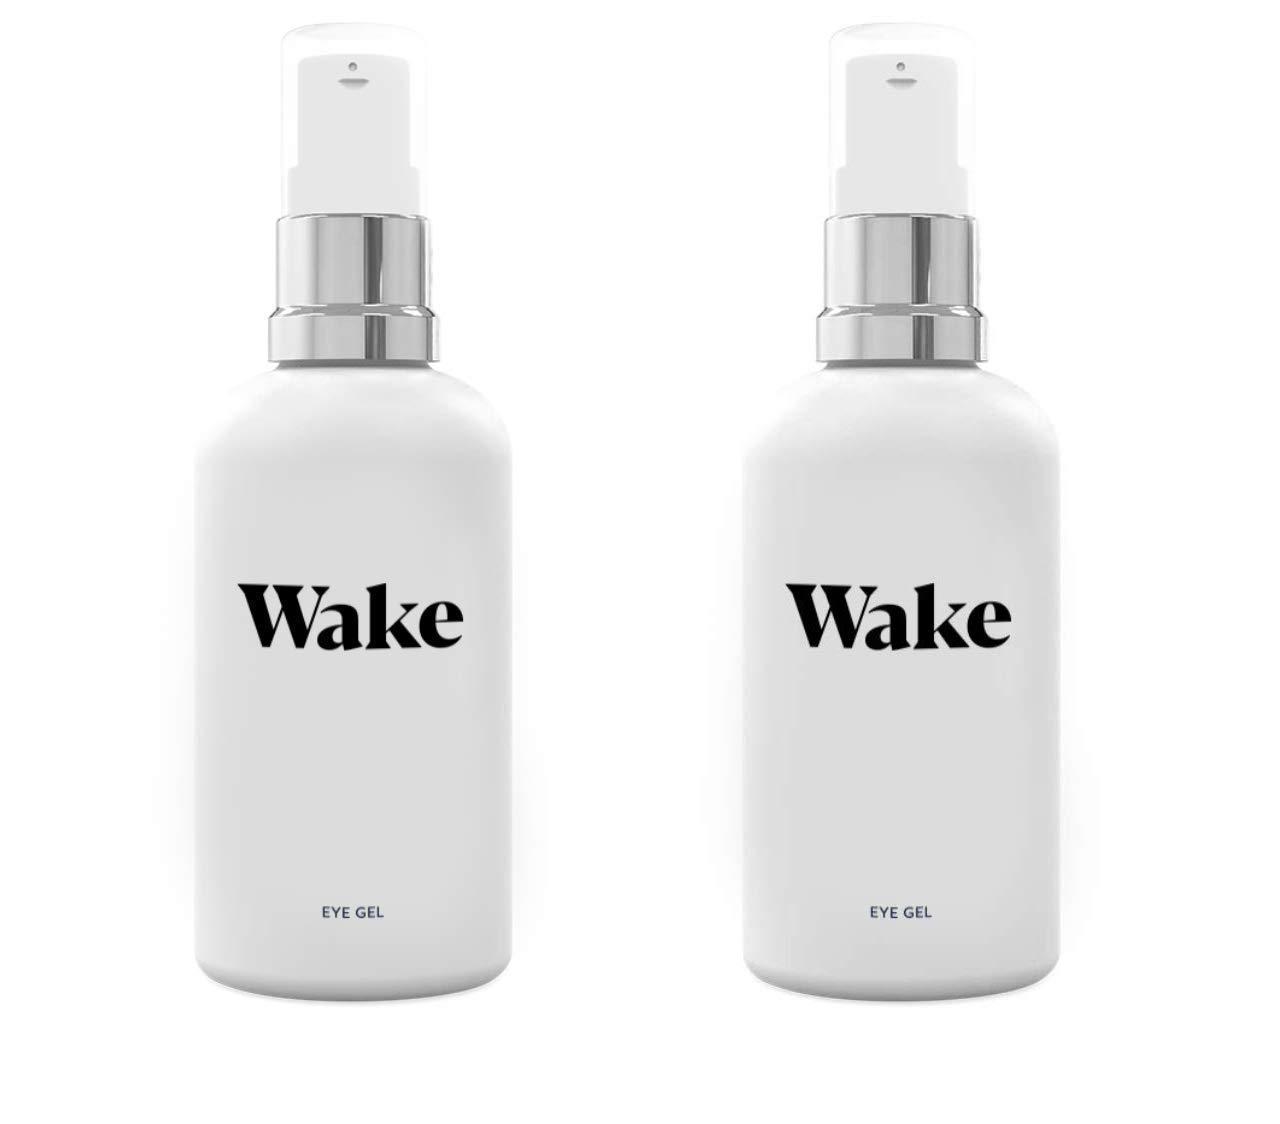 Wake Skincare Eye Gel - Hydrating Eye Serum for Puffy Eyes, Dark Circles, Eye Bags, Crows Feet and Wrinkles - Vitamin E - Collagen - 30ml Anti Ageing Eye Cream (2 Pack) by Wake (Image #2)